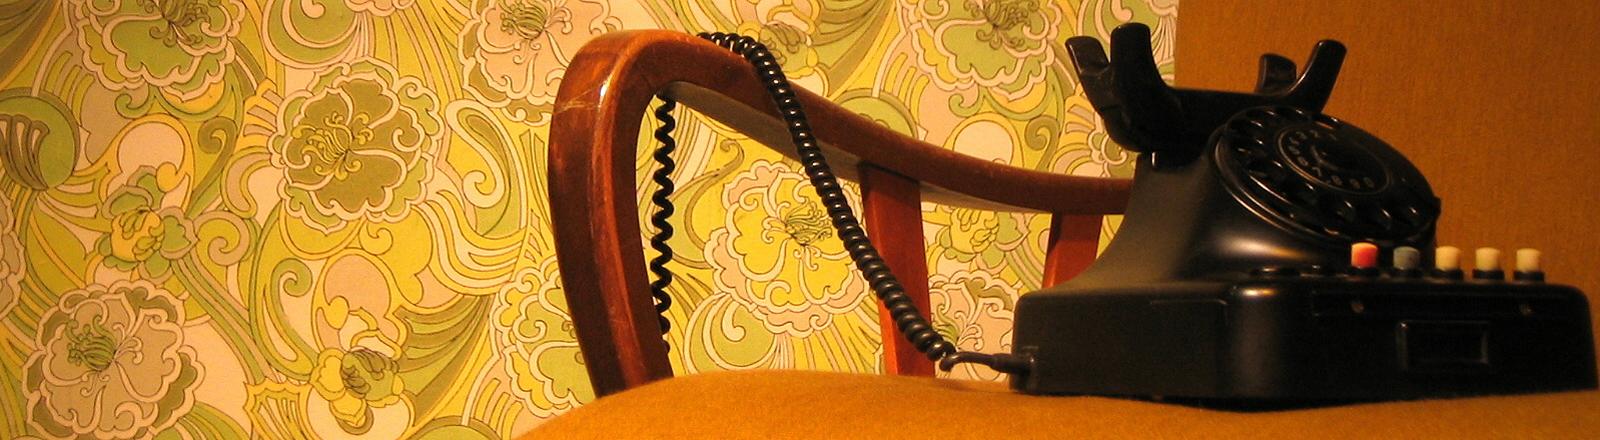 Altes Telefon auf altem Sofa.